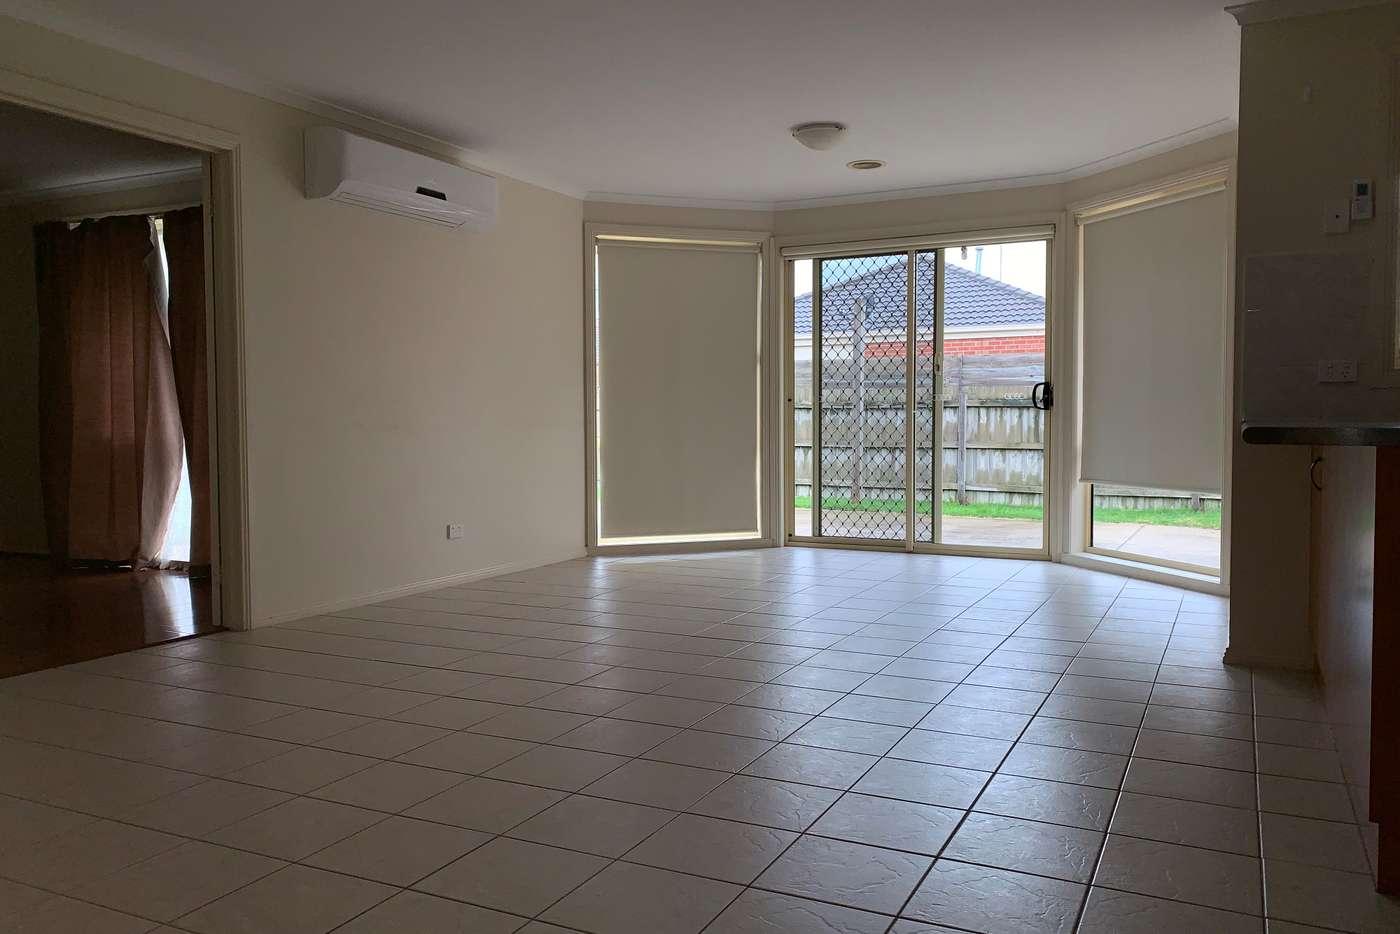 Sixth view of Homely house listing, 29 Park Boulevard, Pakenham VIC 3810